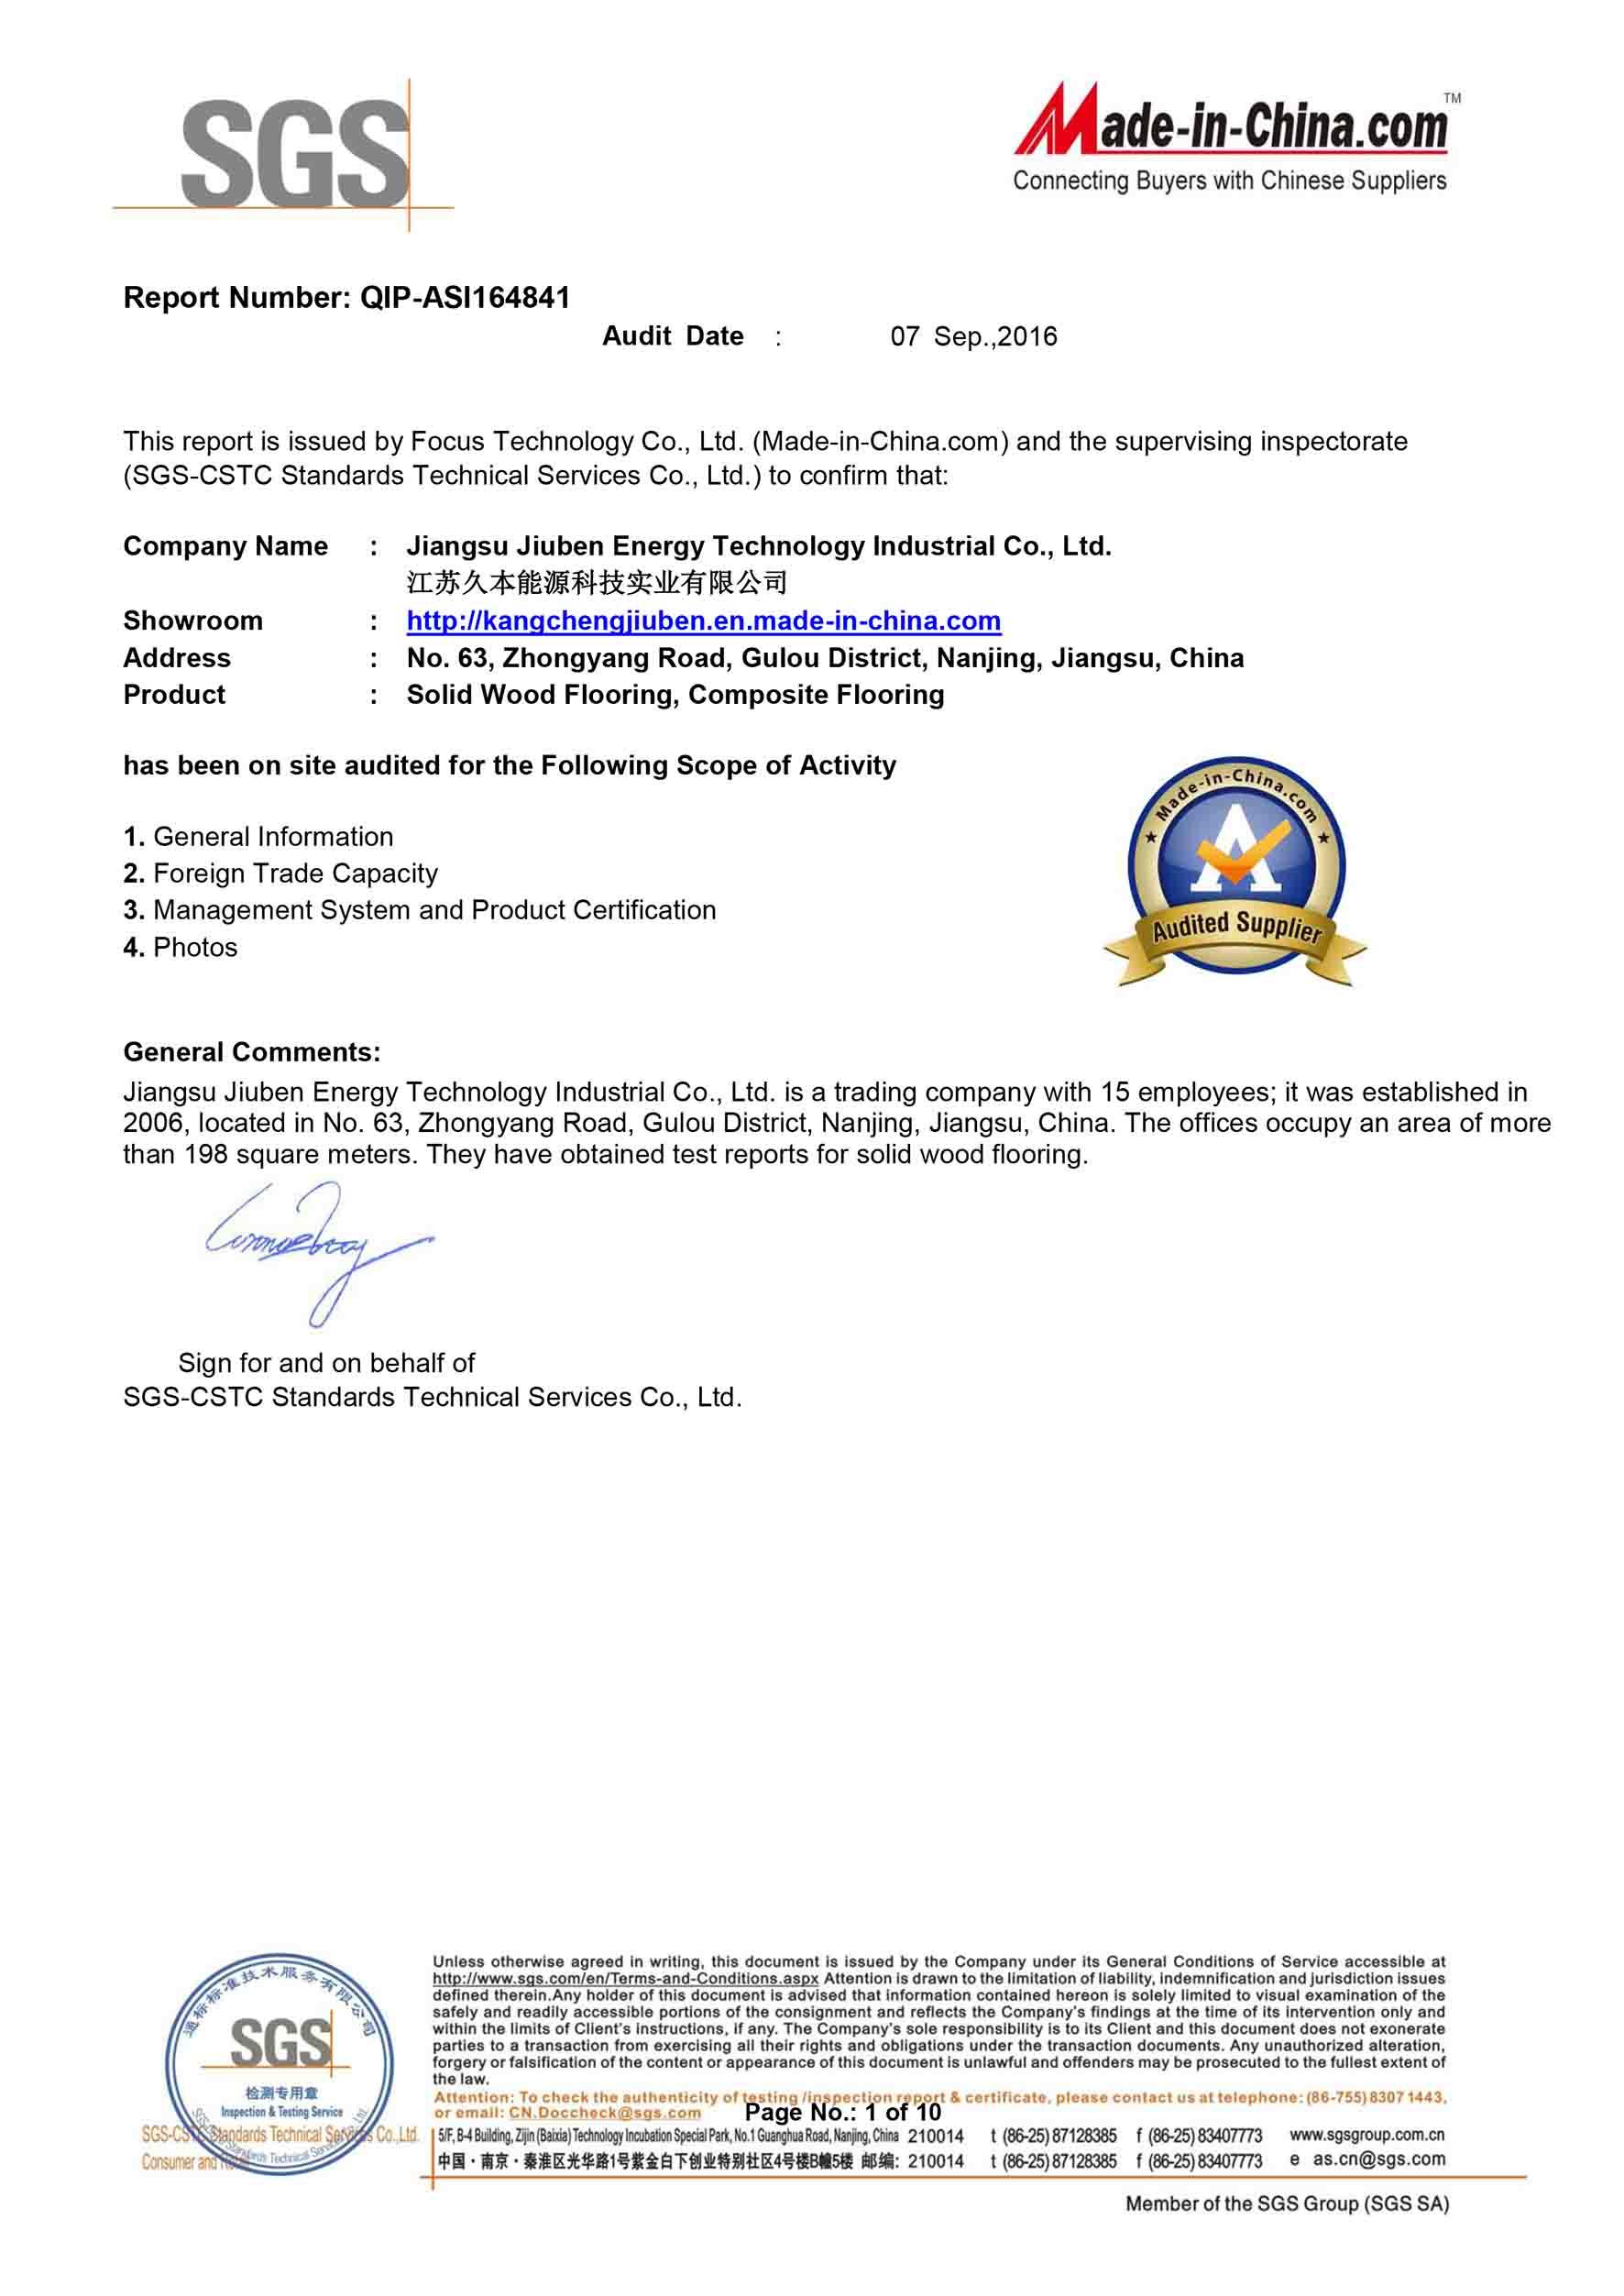 SGS certification report